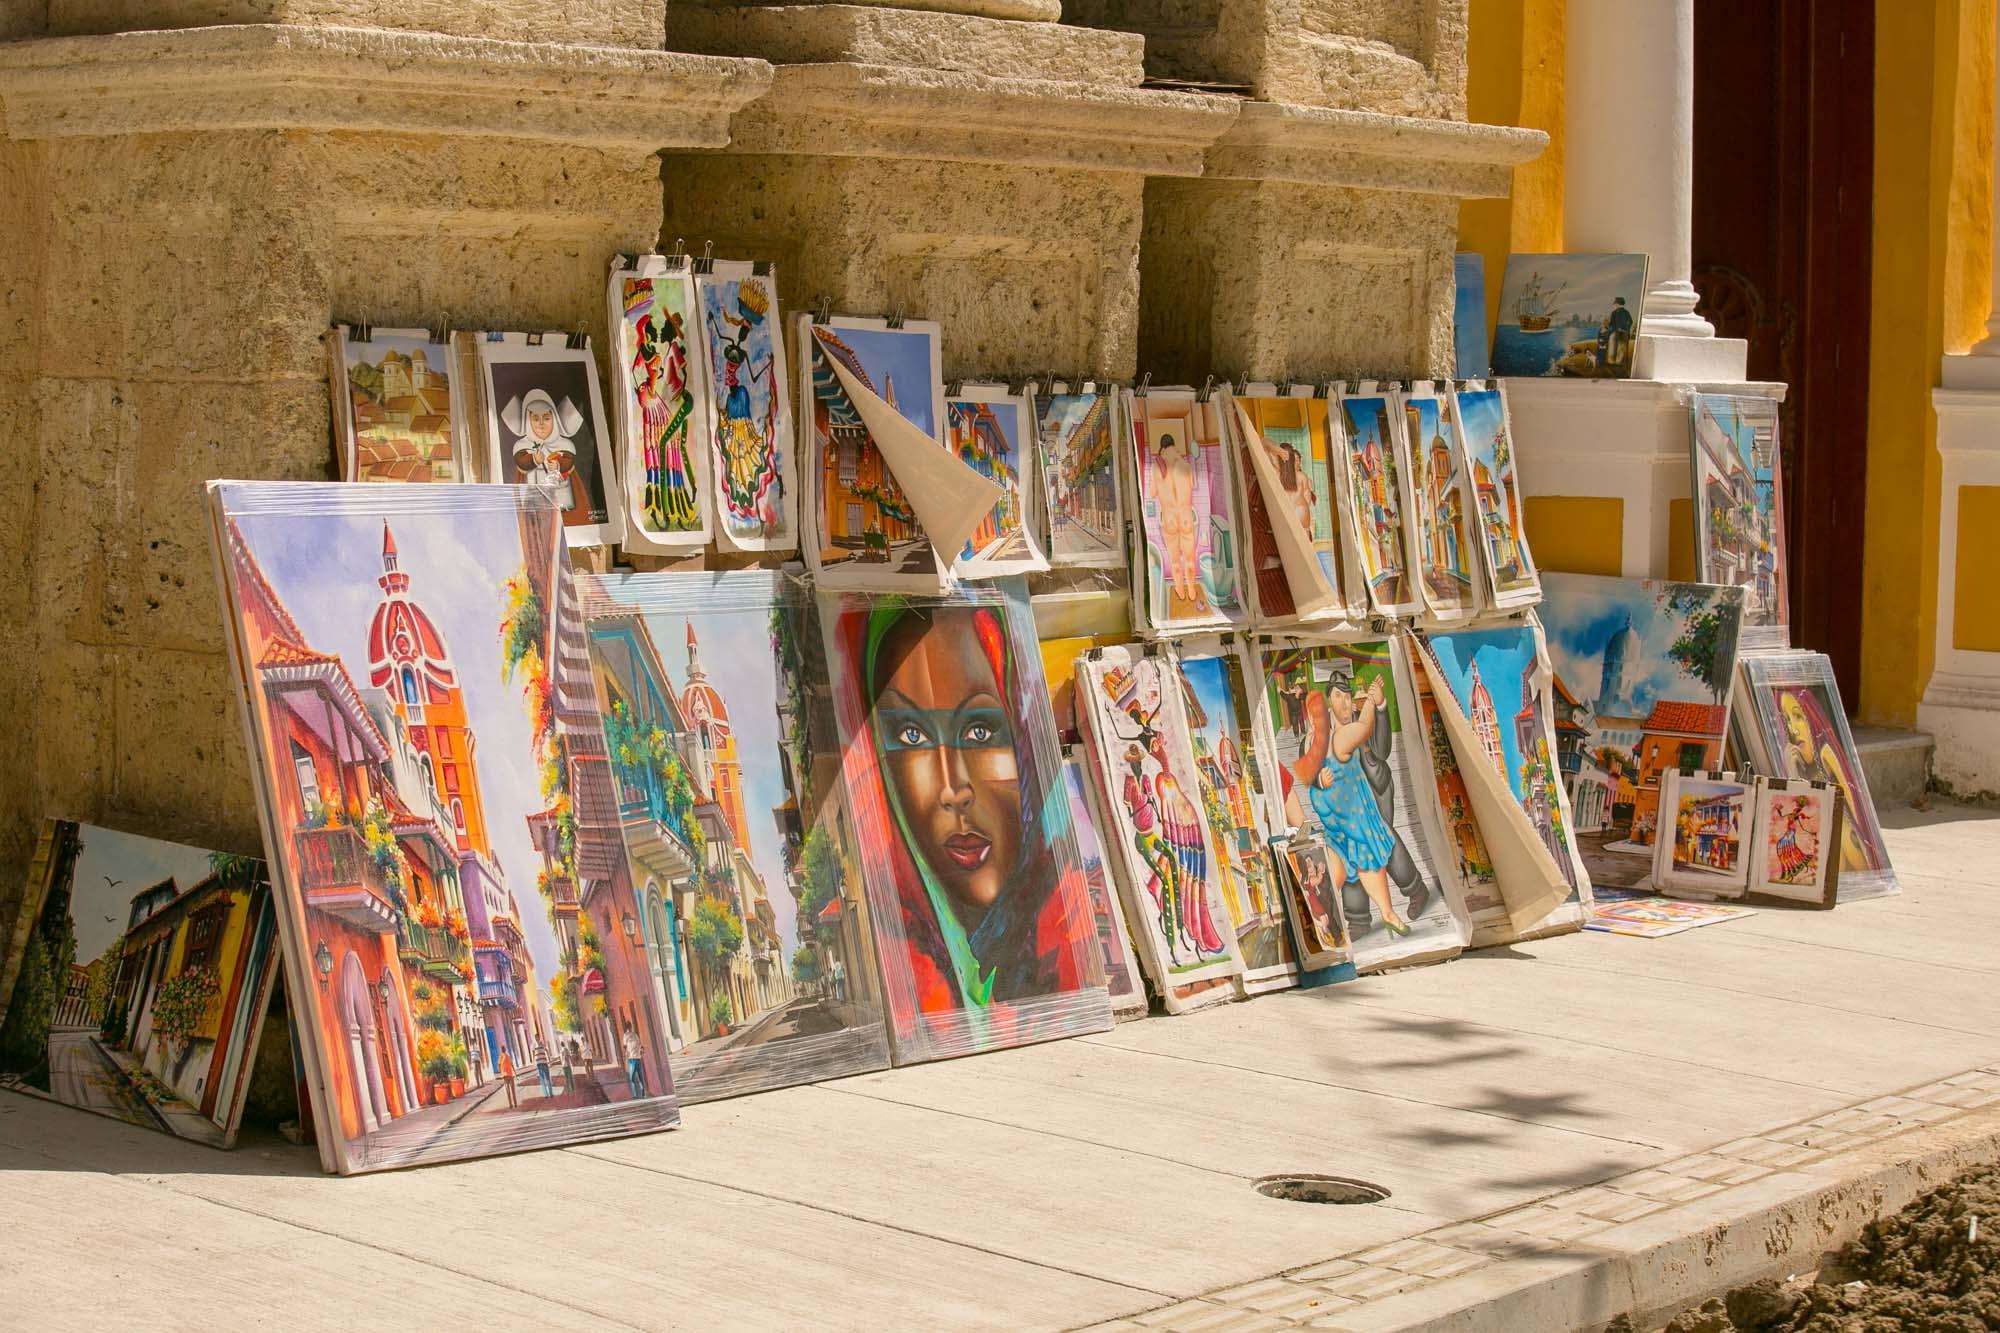 Cartagena art for sale